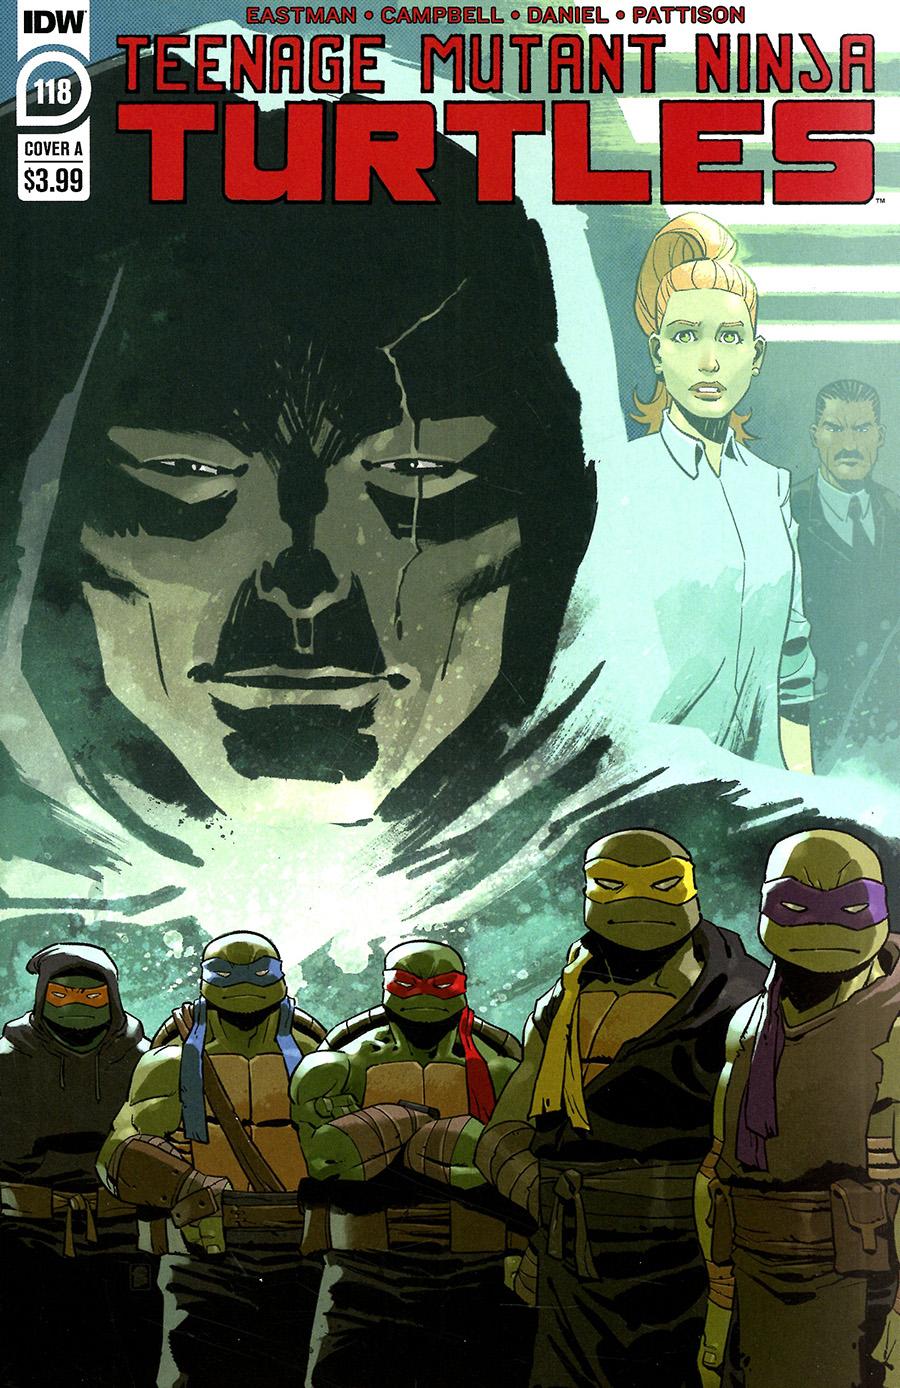 Teenage Mutant Ninja Turtles Vol 5 #118 Cover A Regular Nelson Daniel Cover